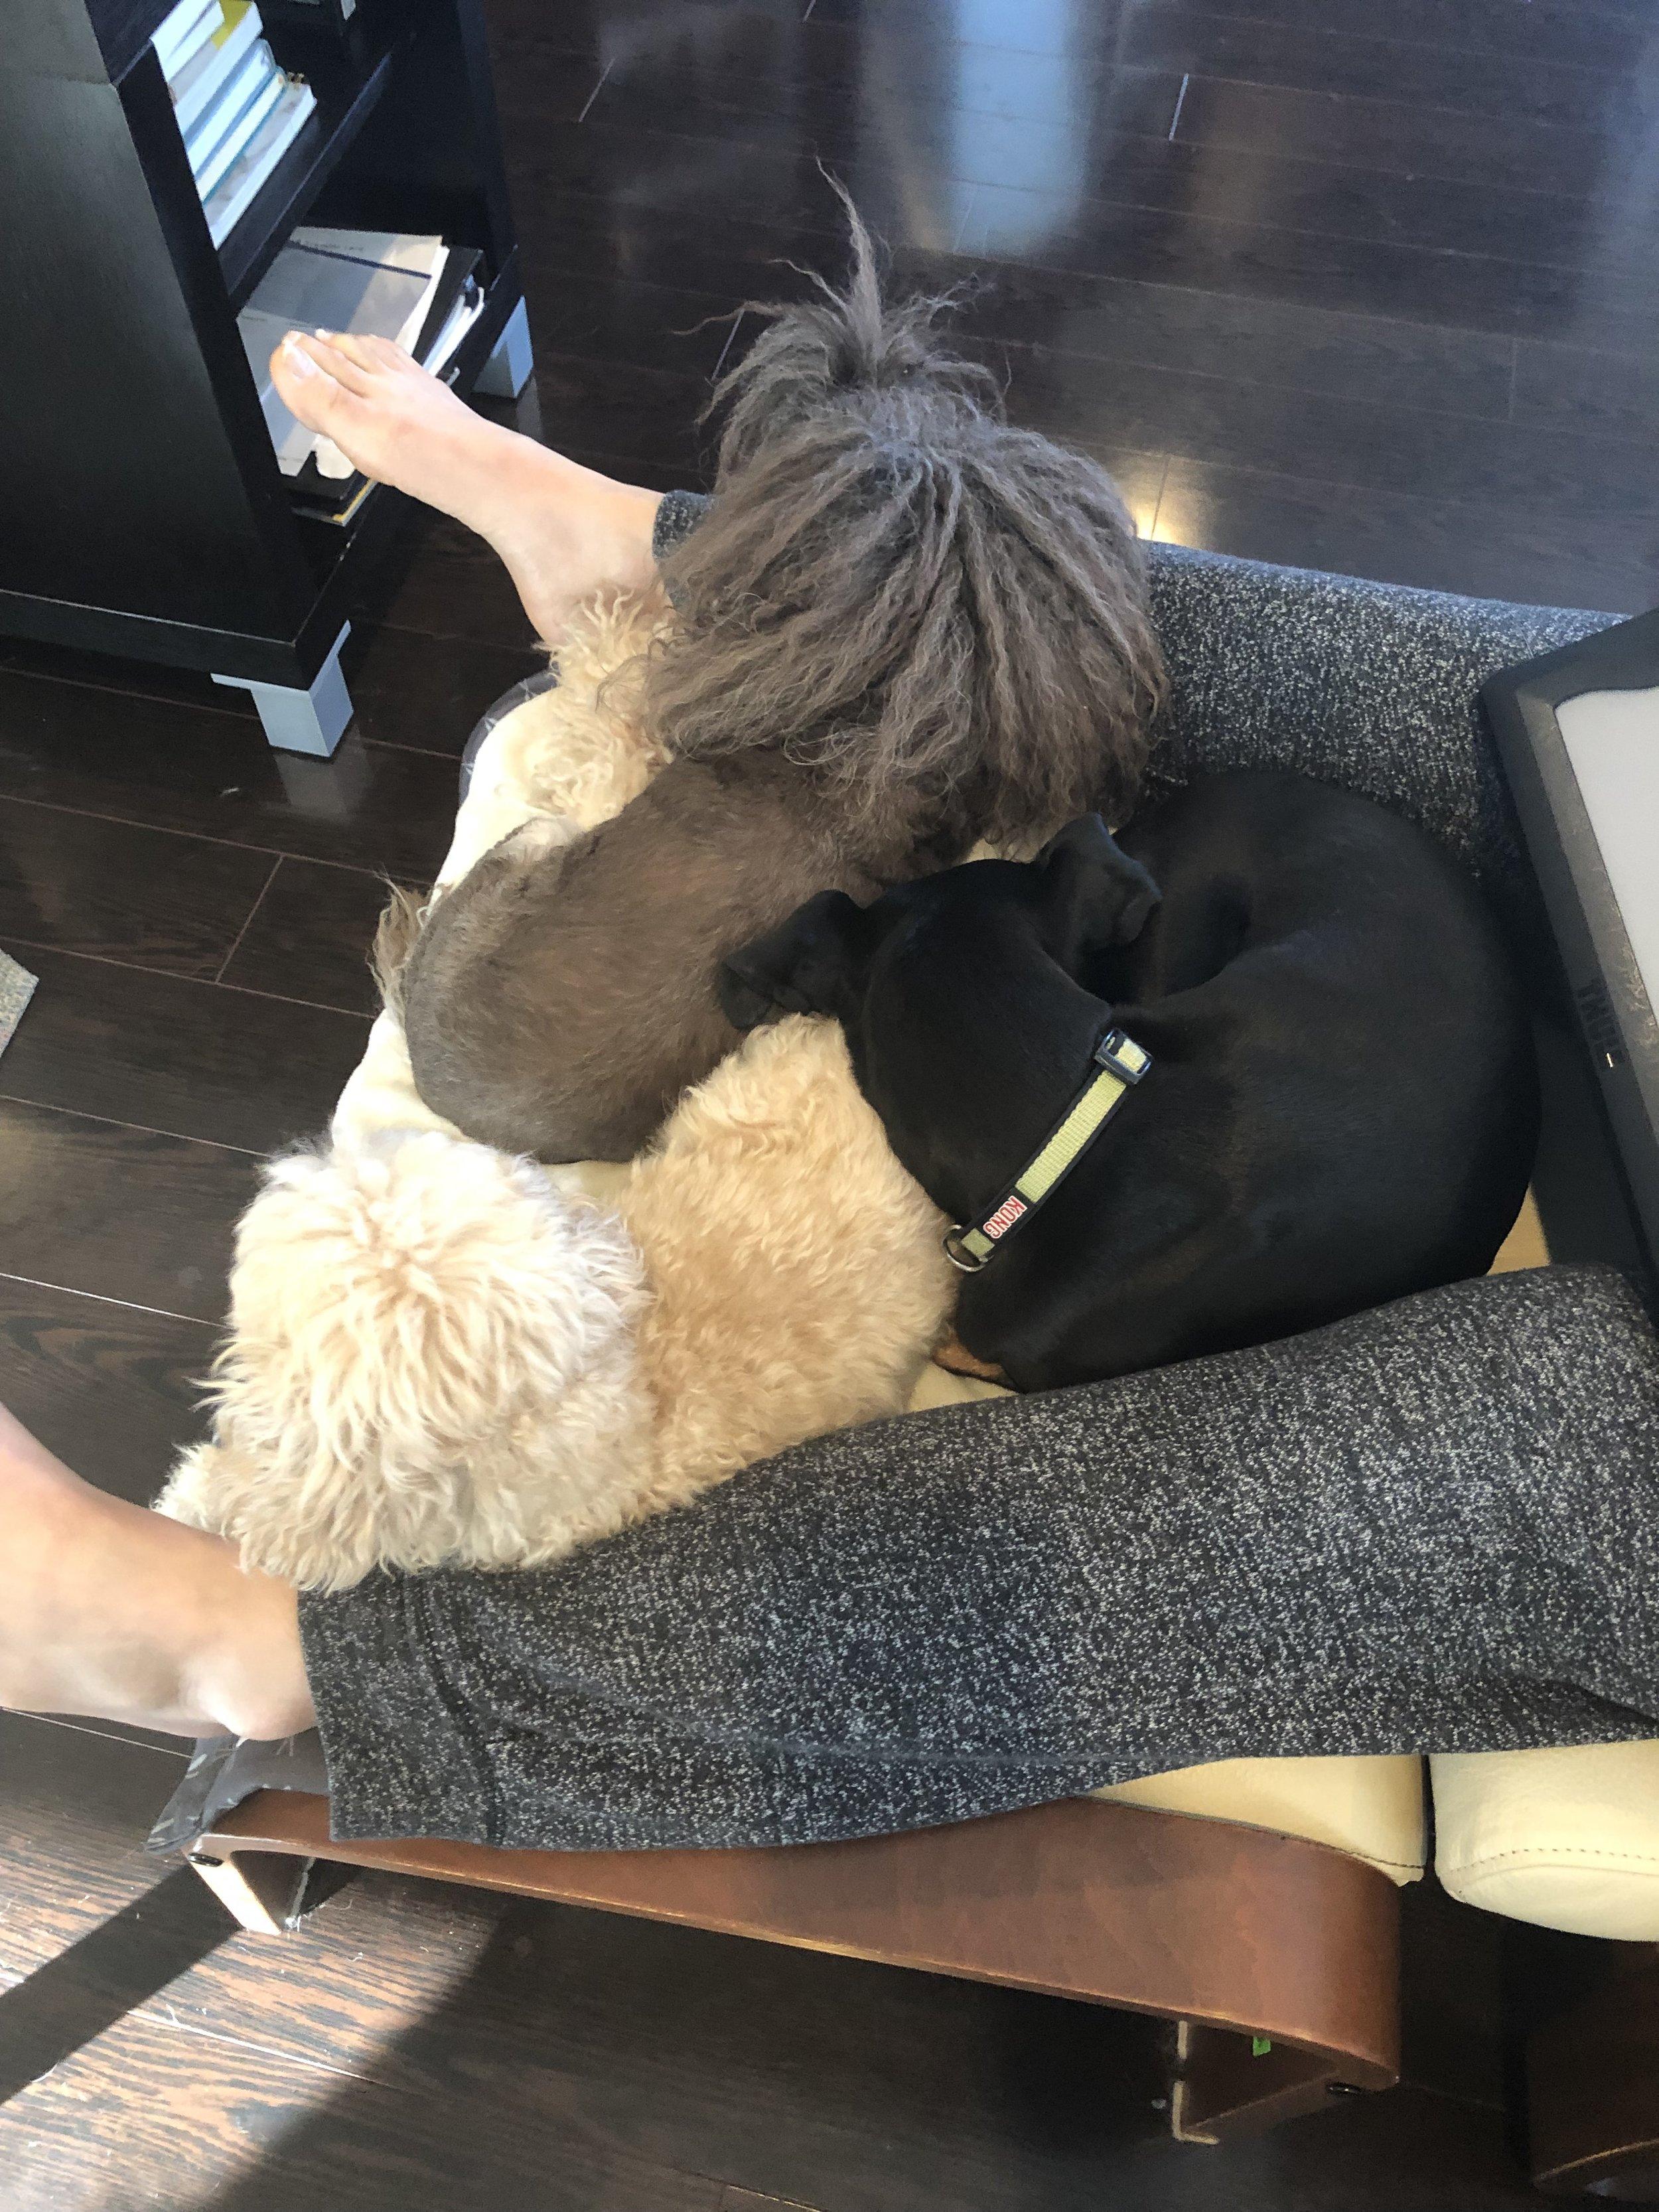 3 cuddling dogs, 1 pair human legs